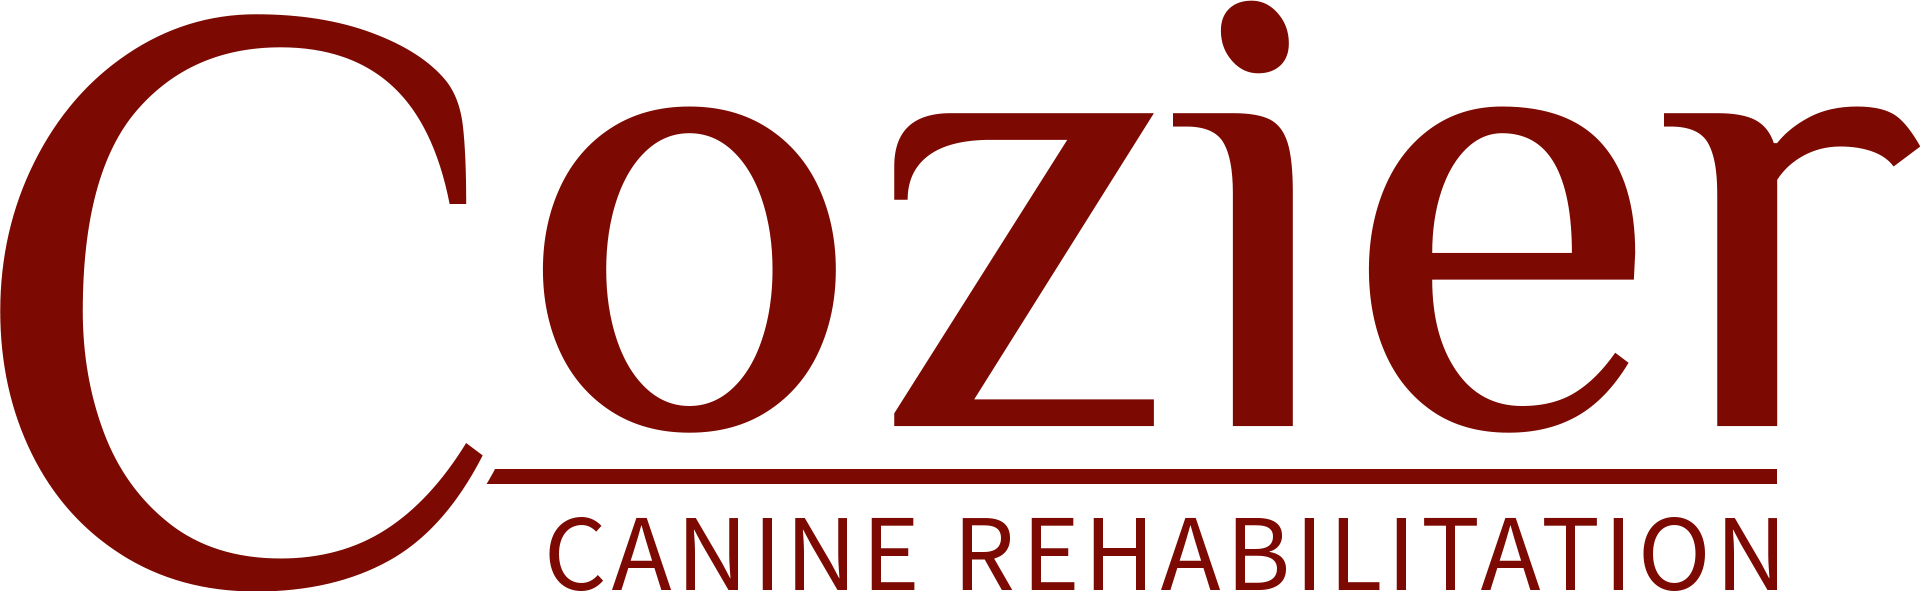 Cozier Canine Rehabilitation logo